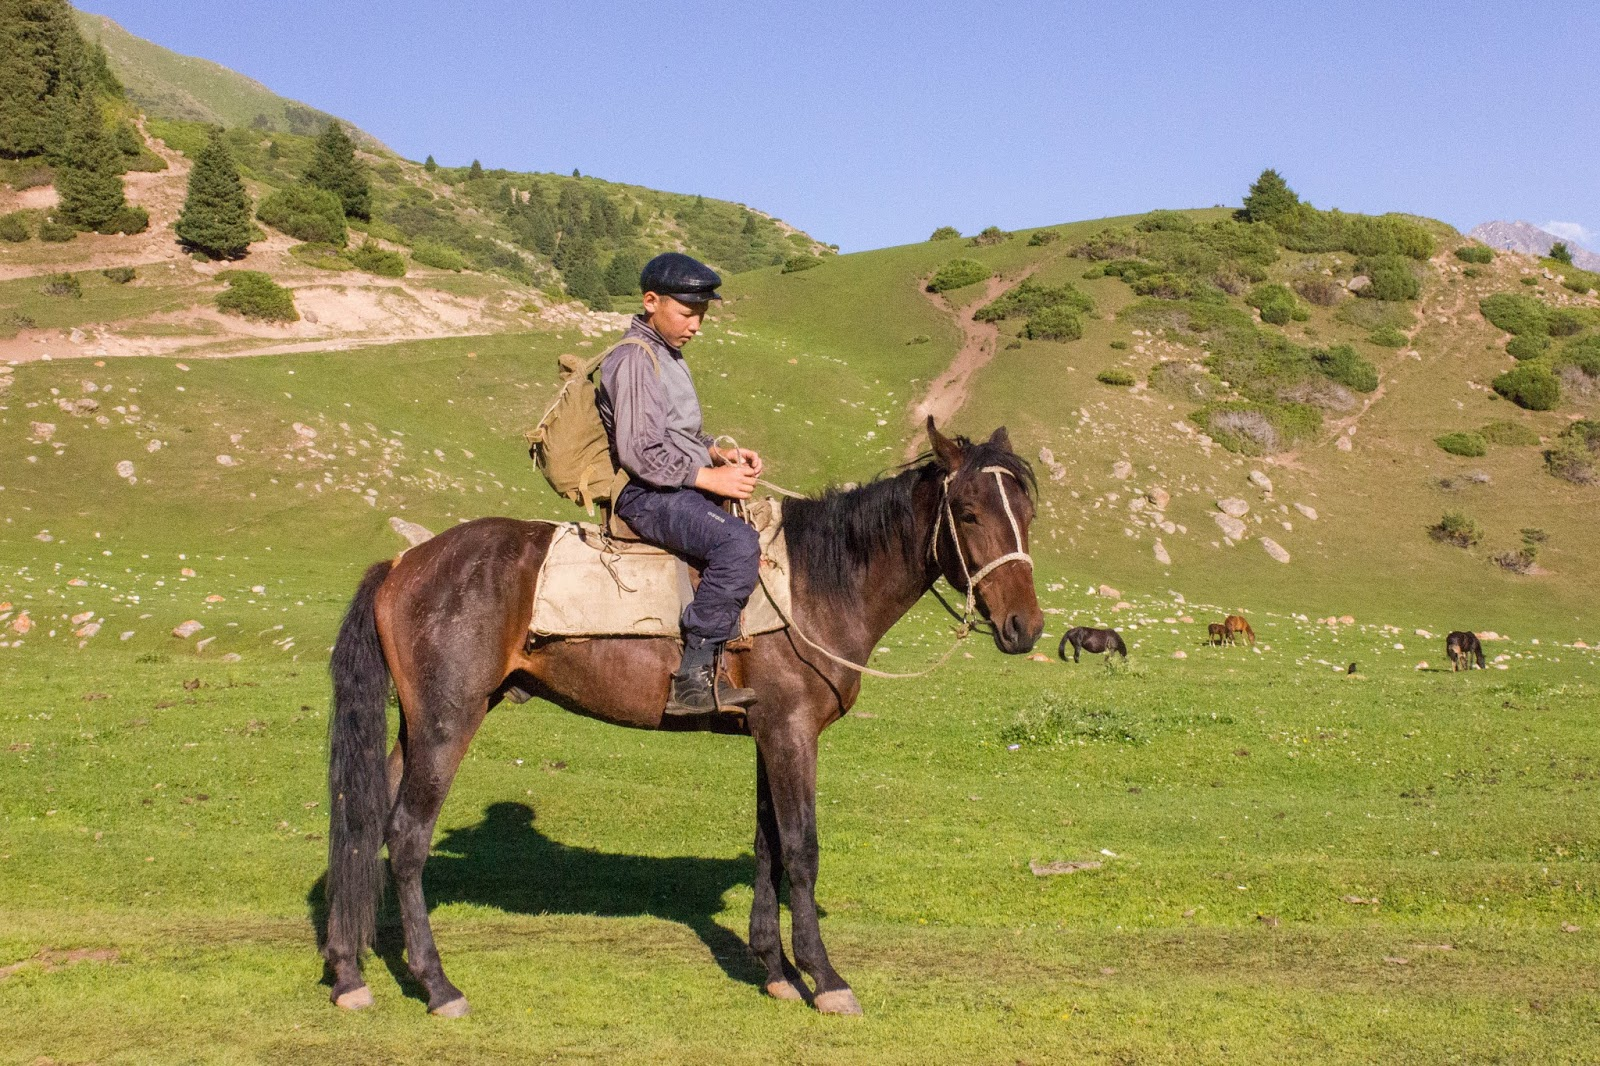 Кыргызстан, Джеты-Огуз, Иссык-Куль, лошадь